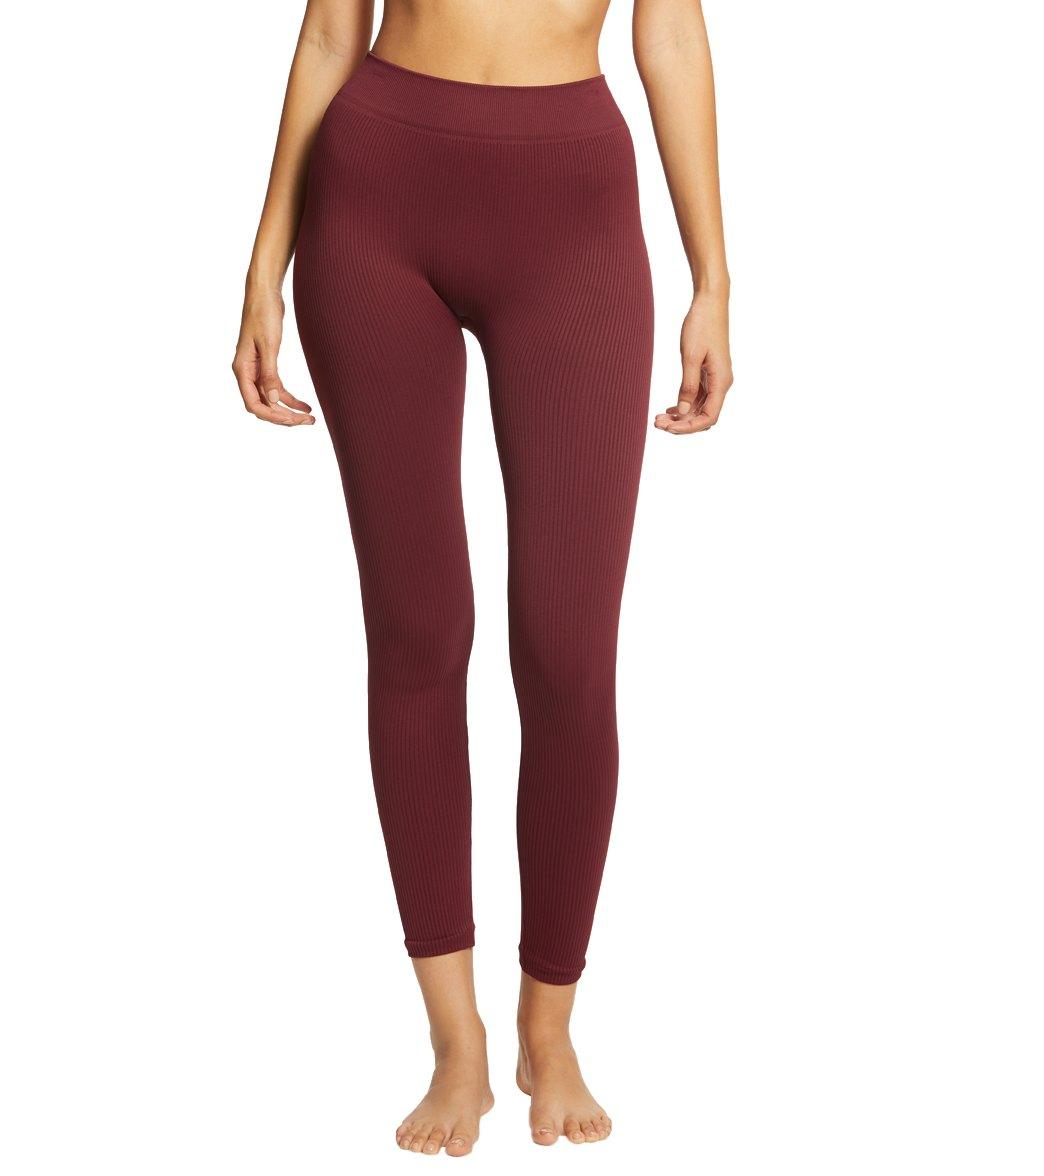 981f0b0c4b007 Spiritual Gangster Rishi Seamless Yoga Leggings at YogaOutlet.com - Free  Shipping